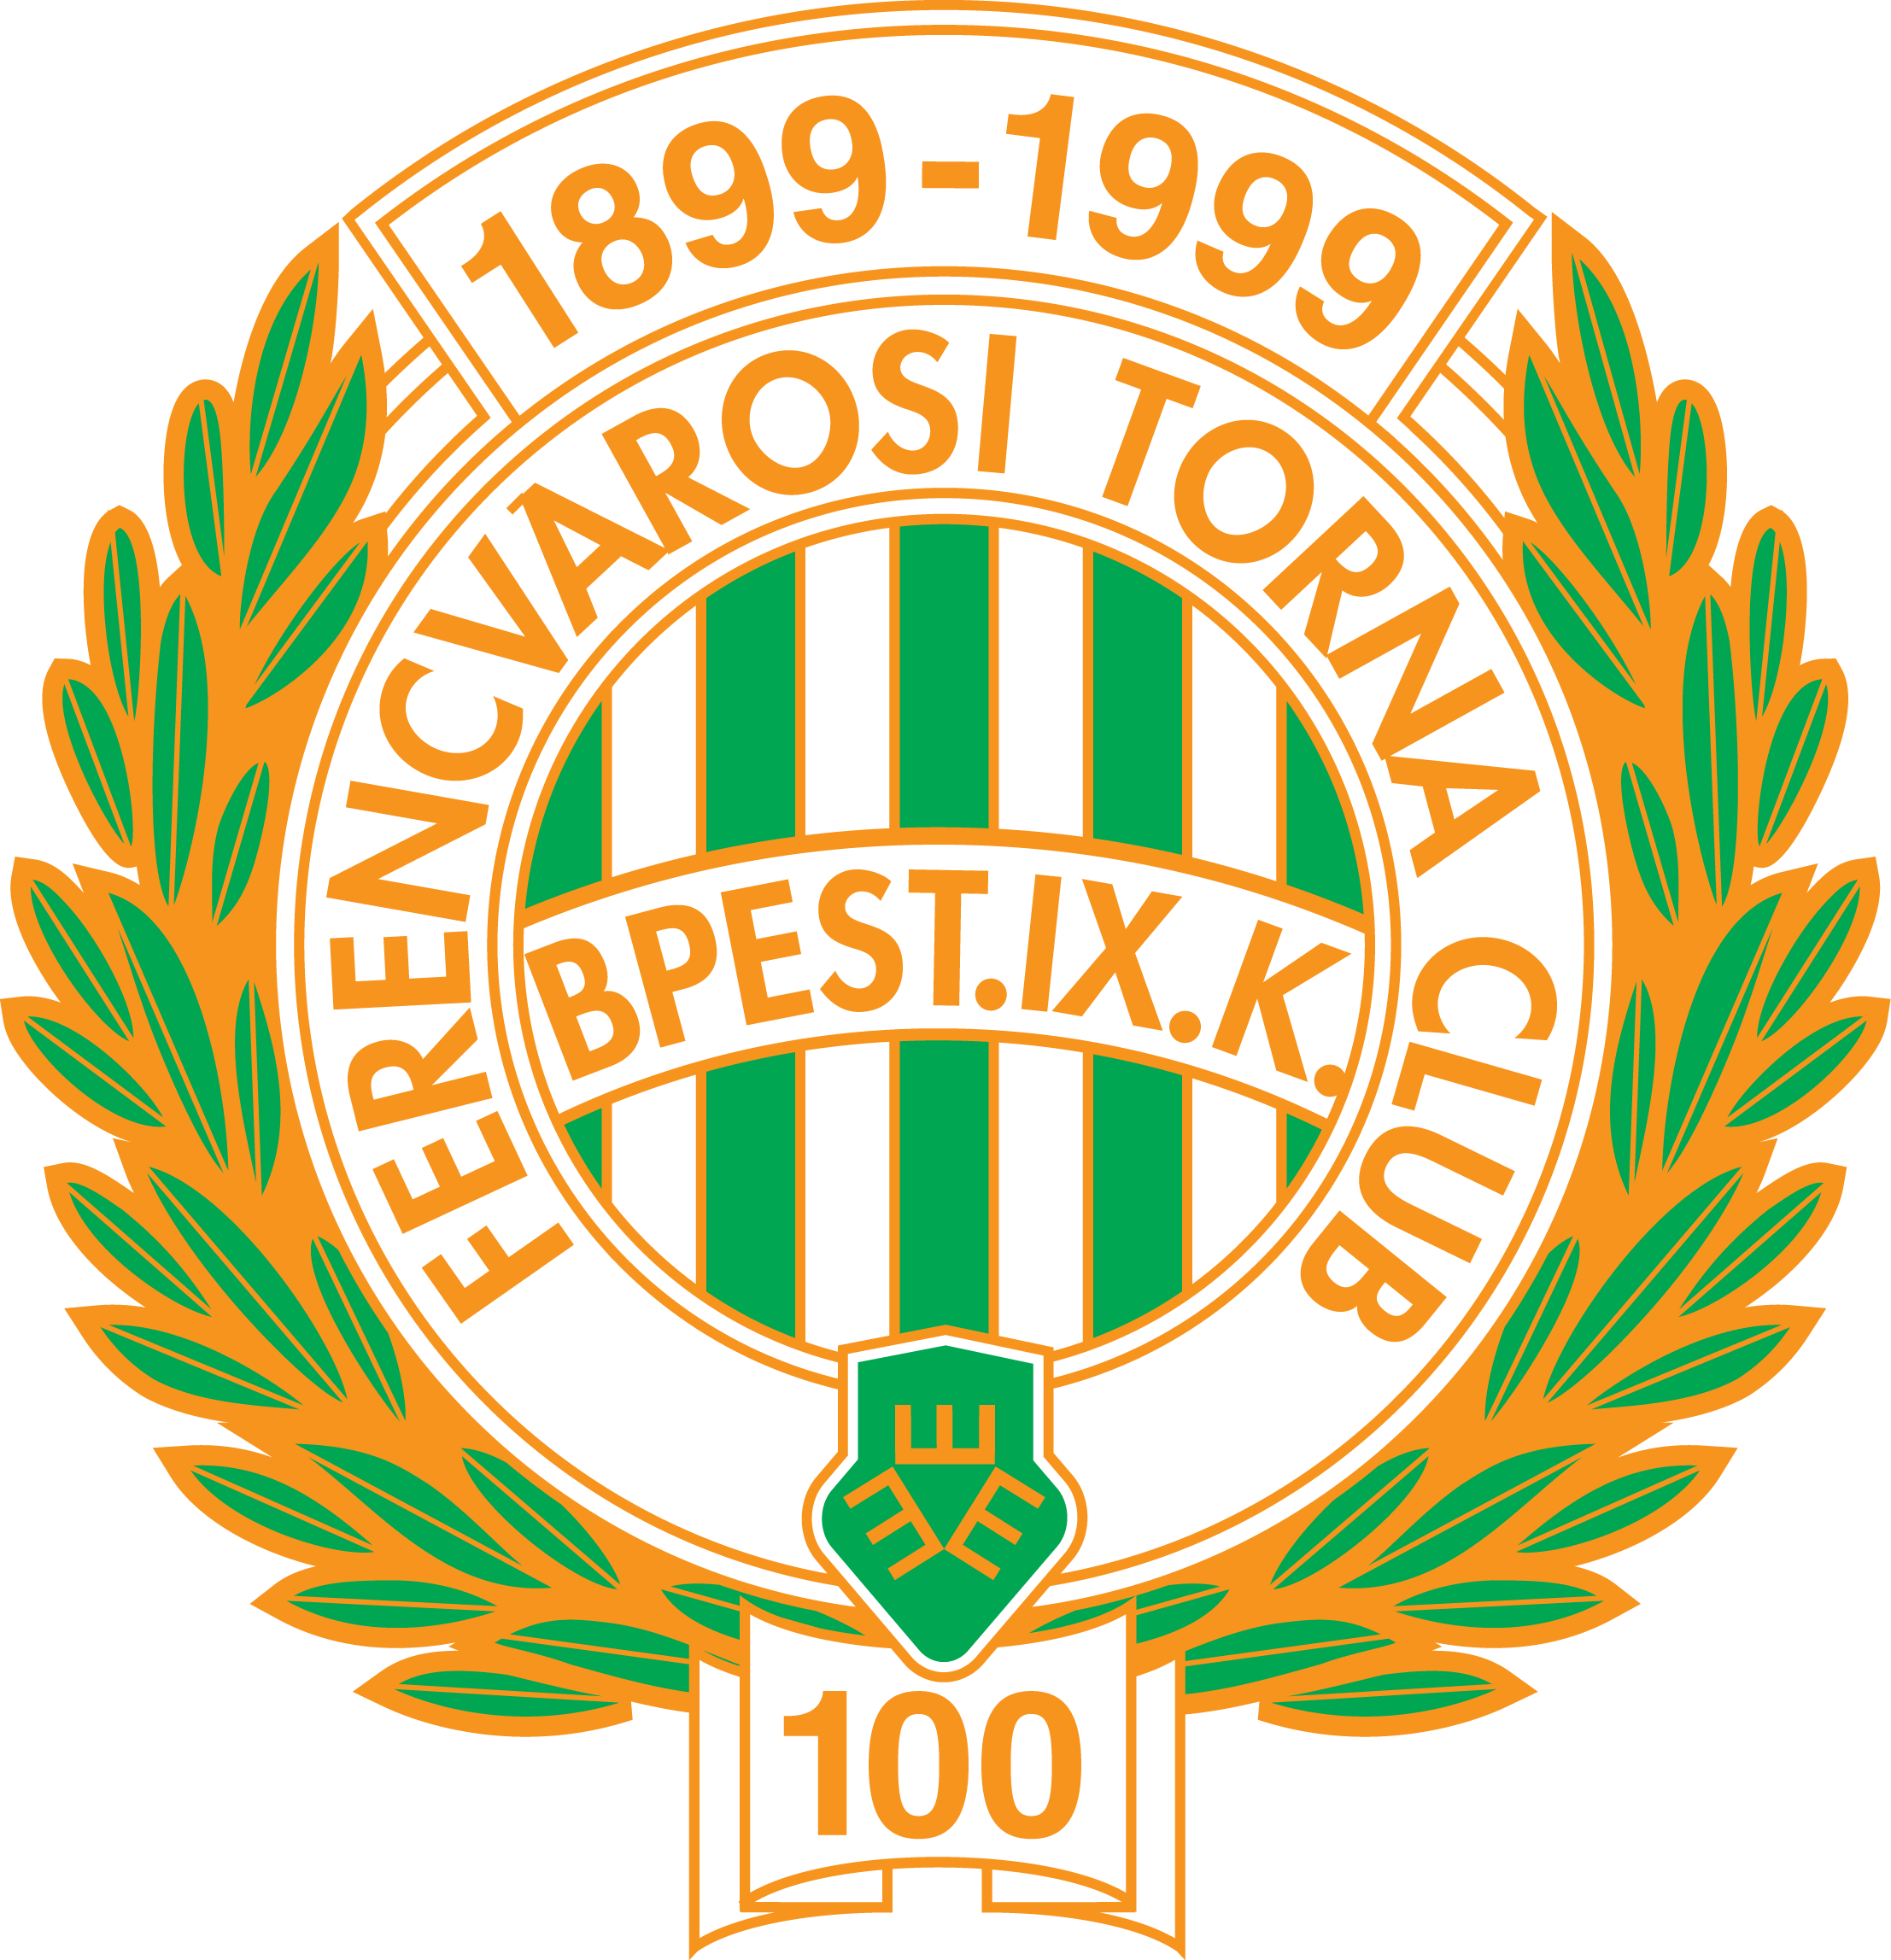 Ferencvaros | Football logo, Logos, Peace symbol